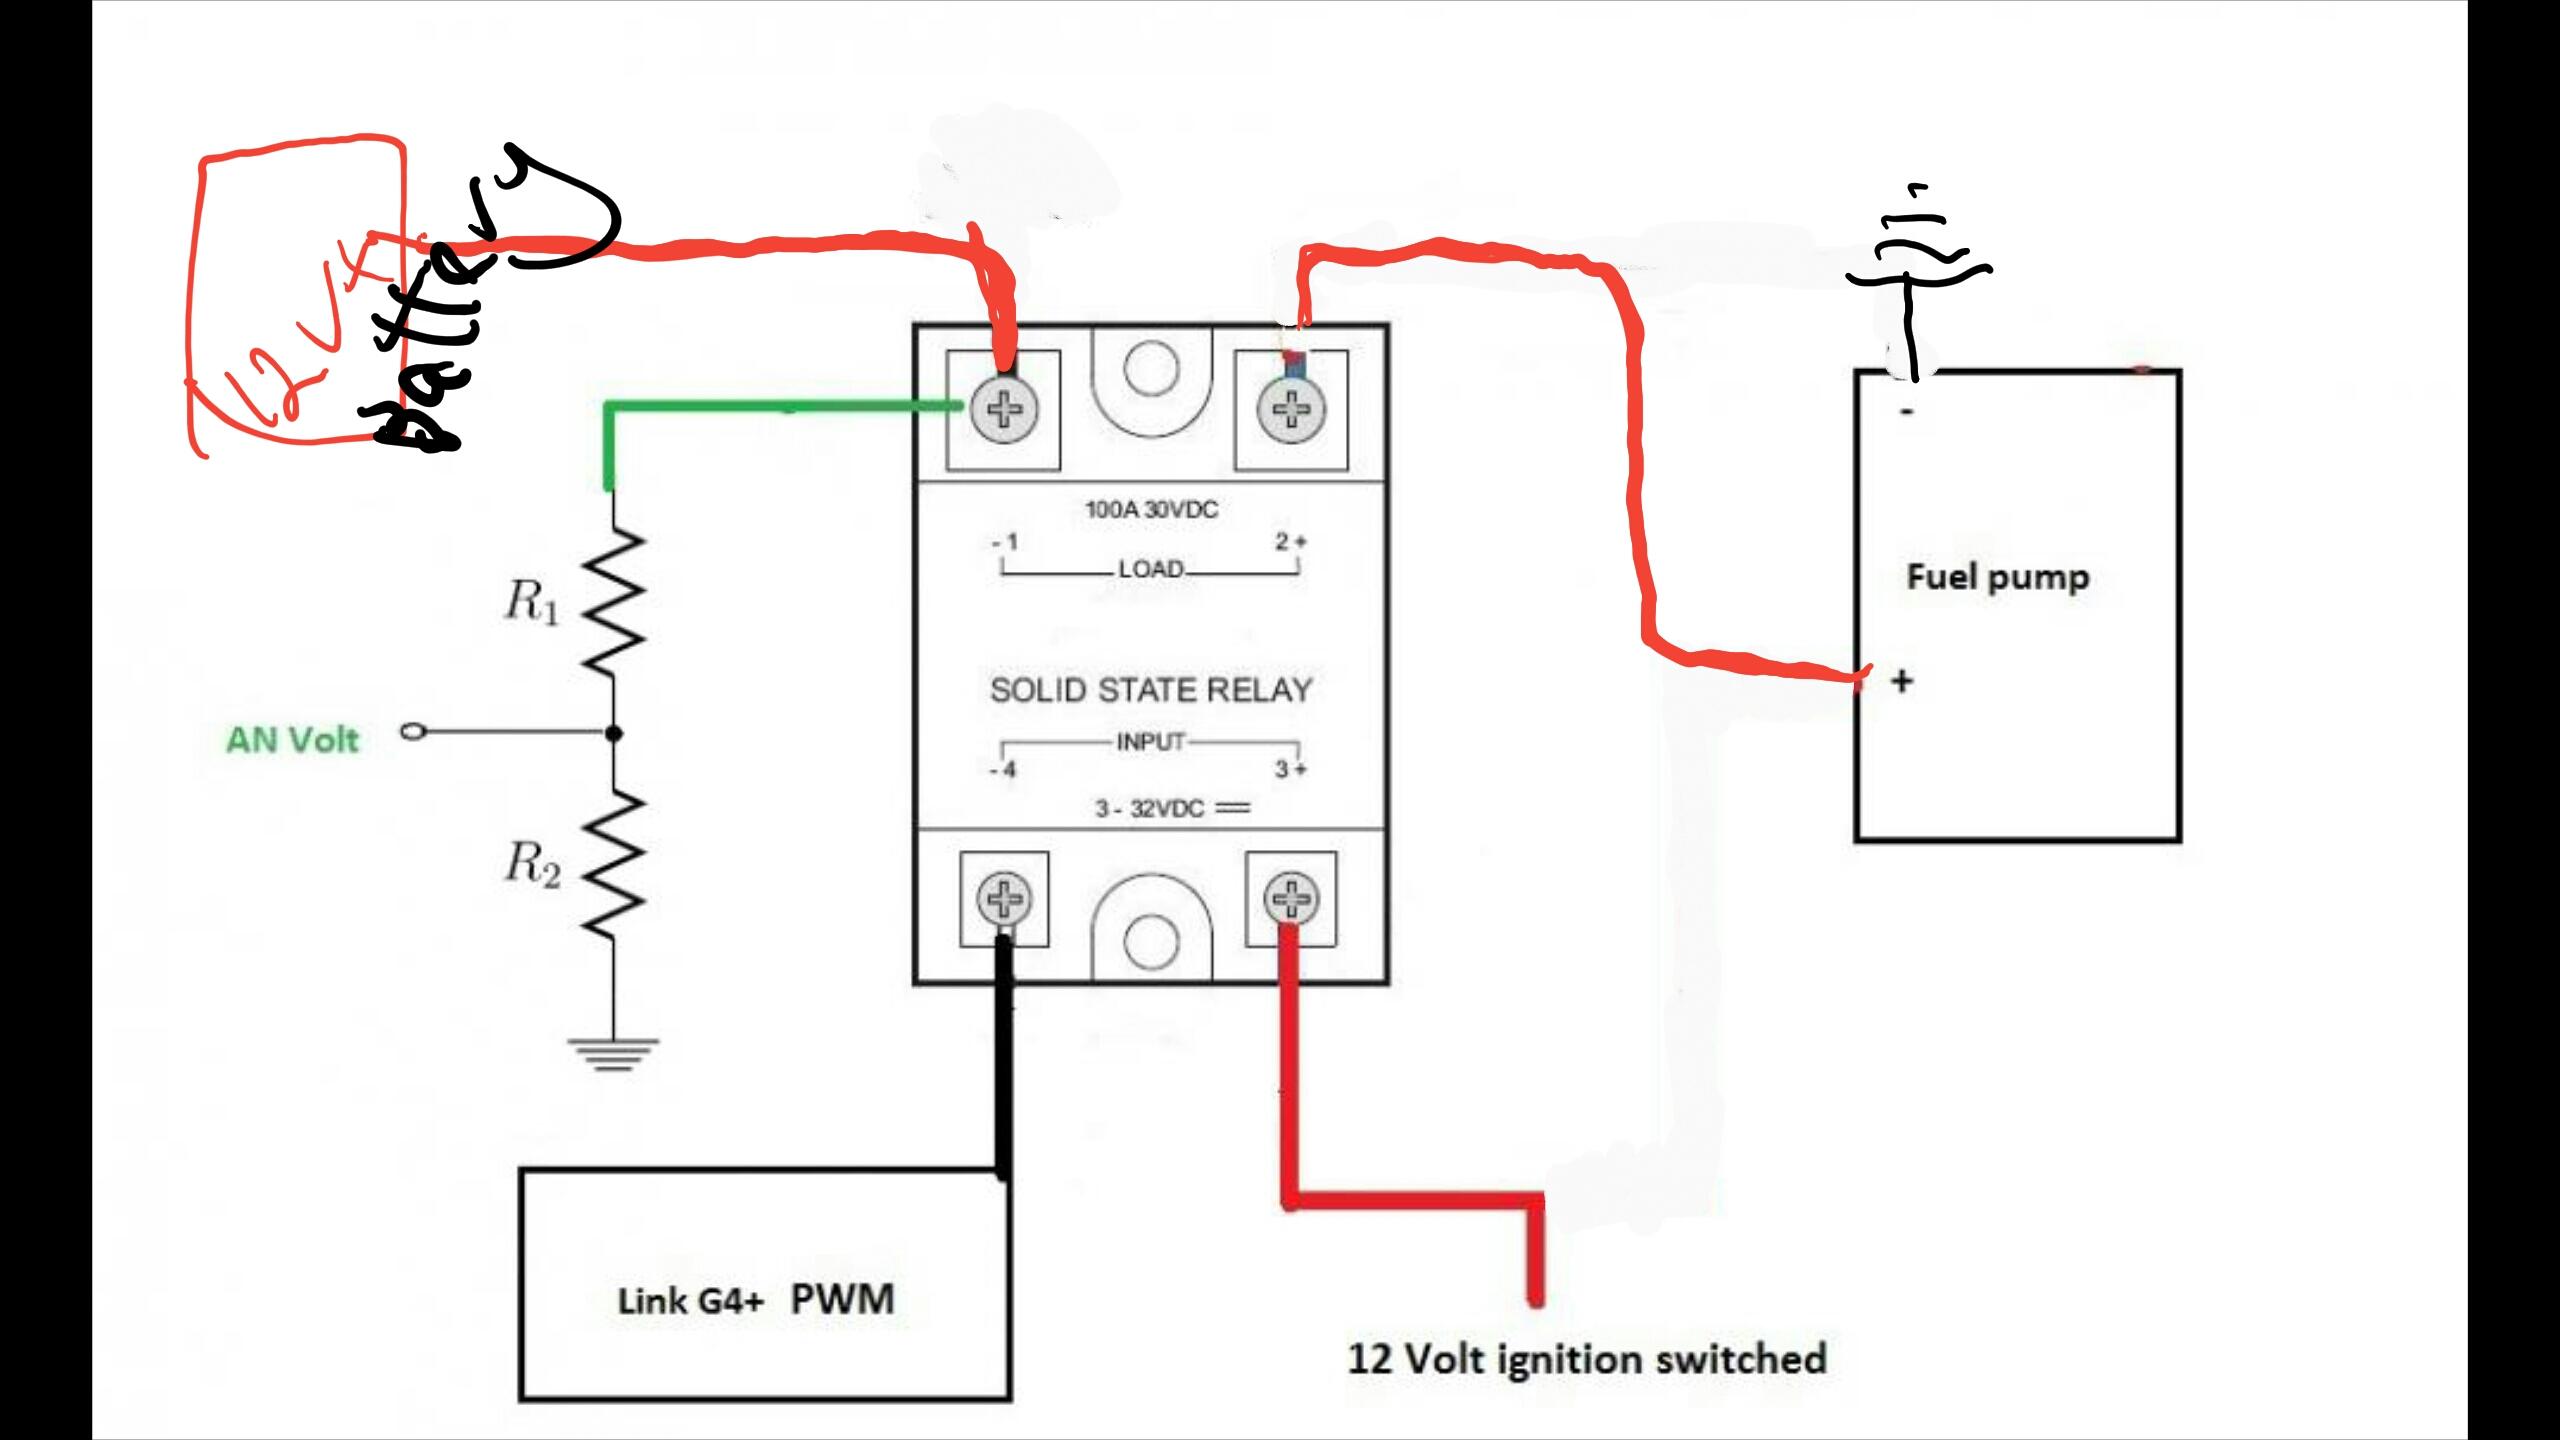 solid state relay wiring diagram sun super tach ii soild relays g4 link engine management screenshot 2017 09 28 11 57 58 jpg